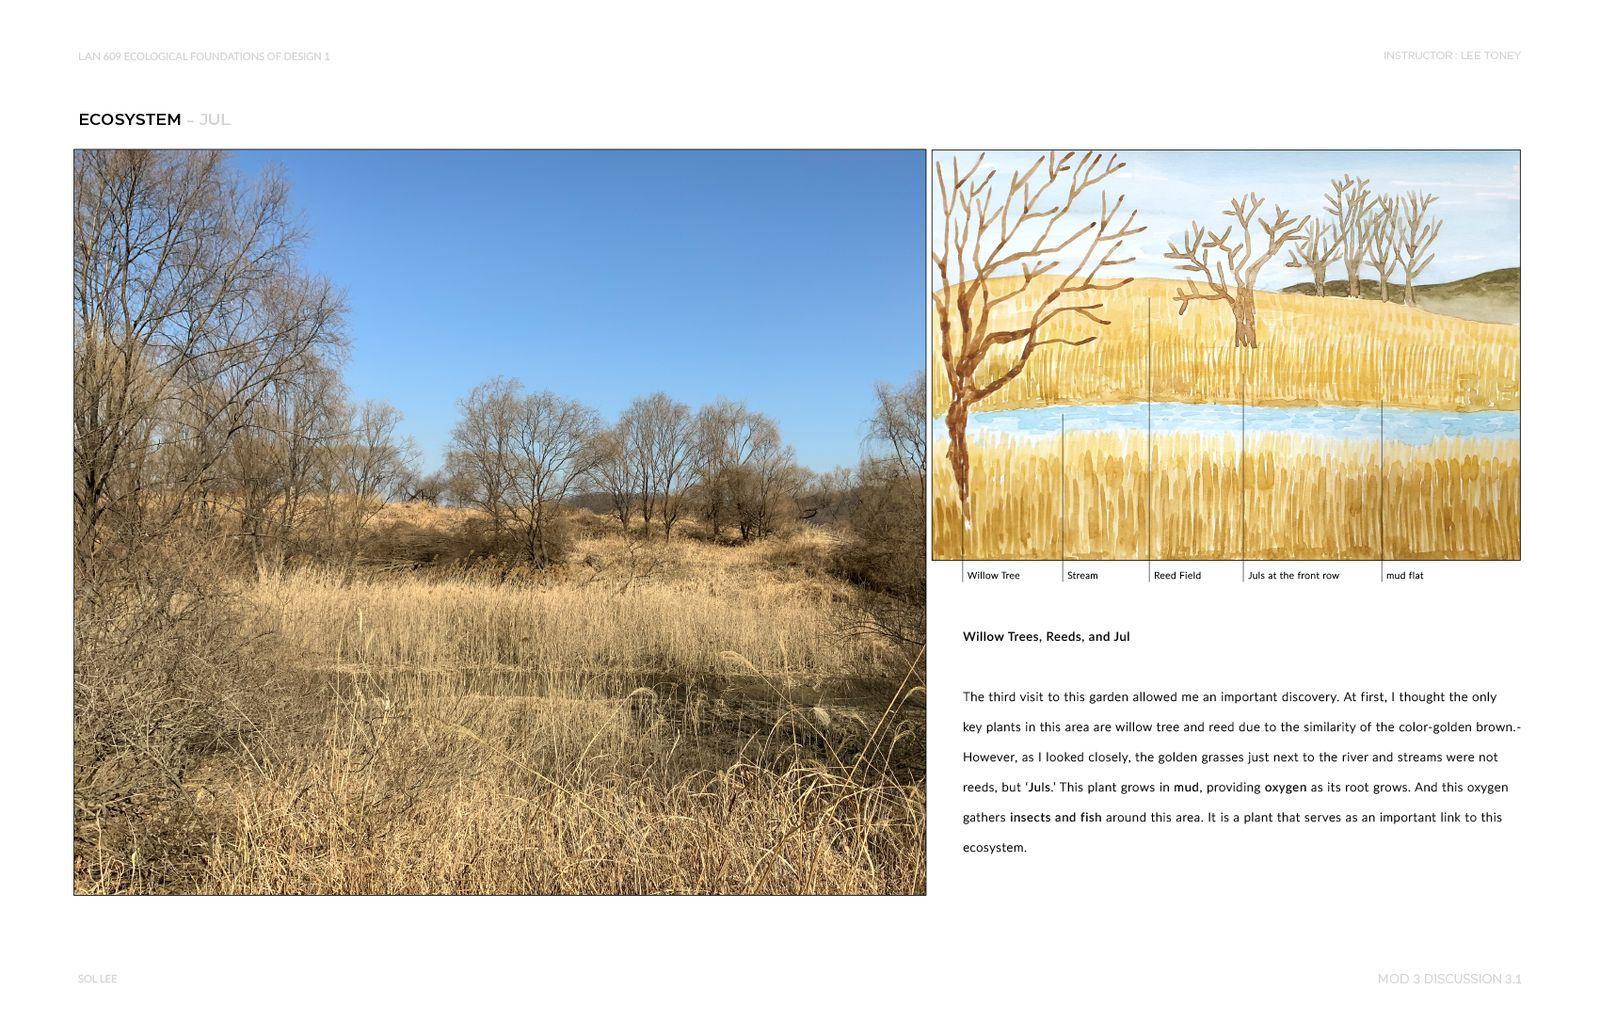 Gangseo Wet Ecology Park - Ecosystem - Jul